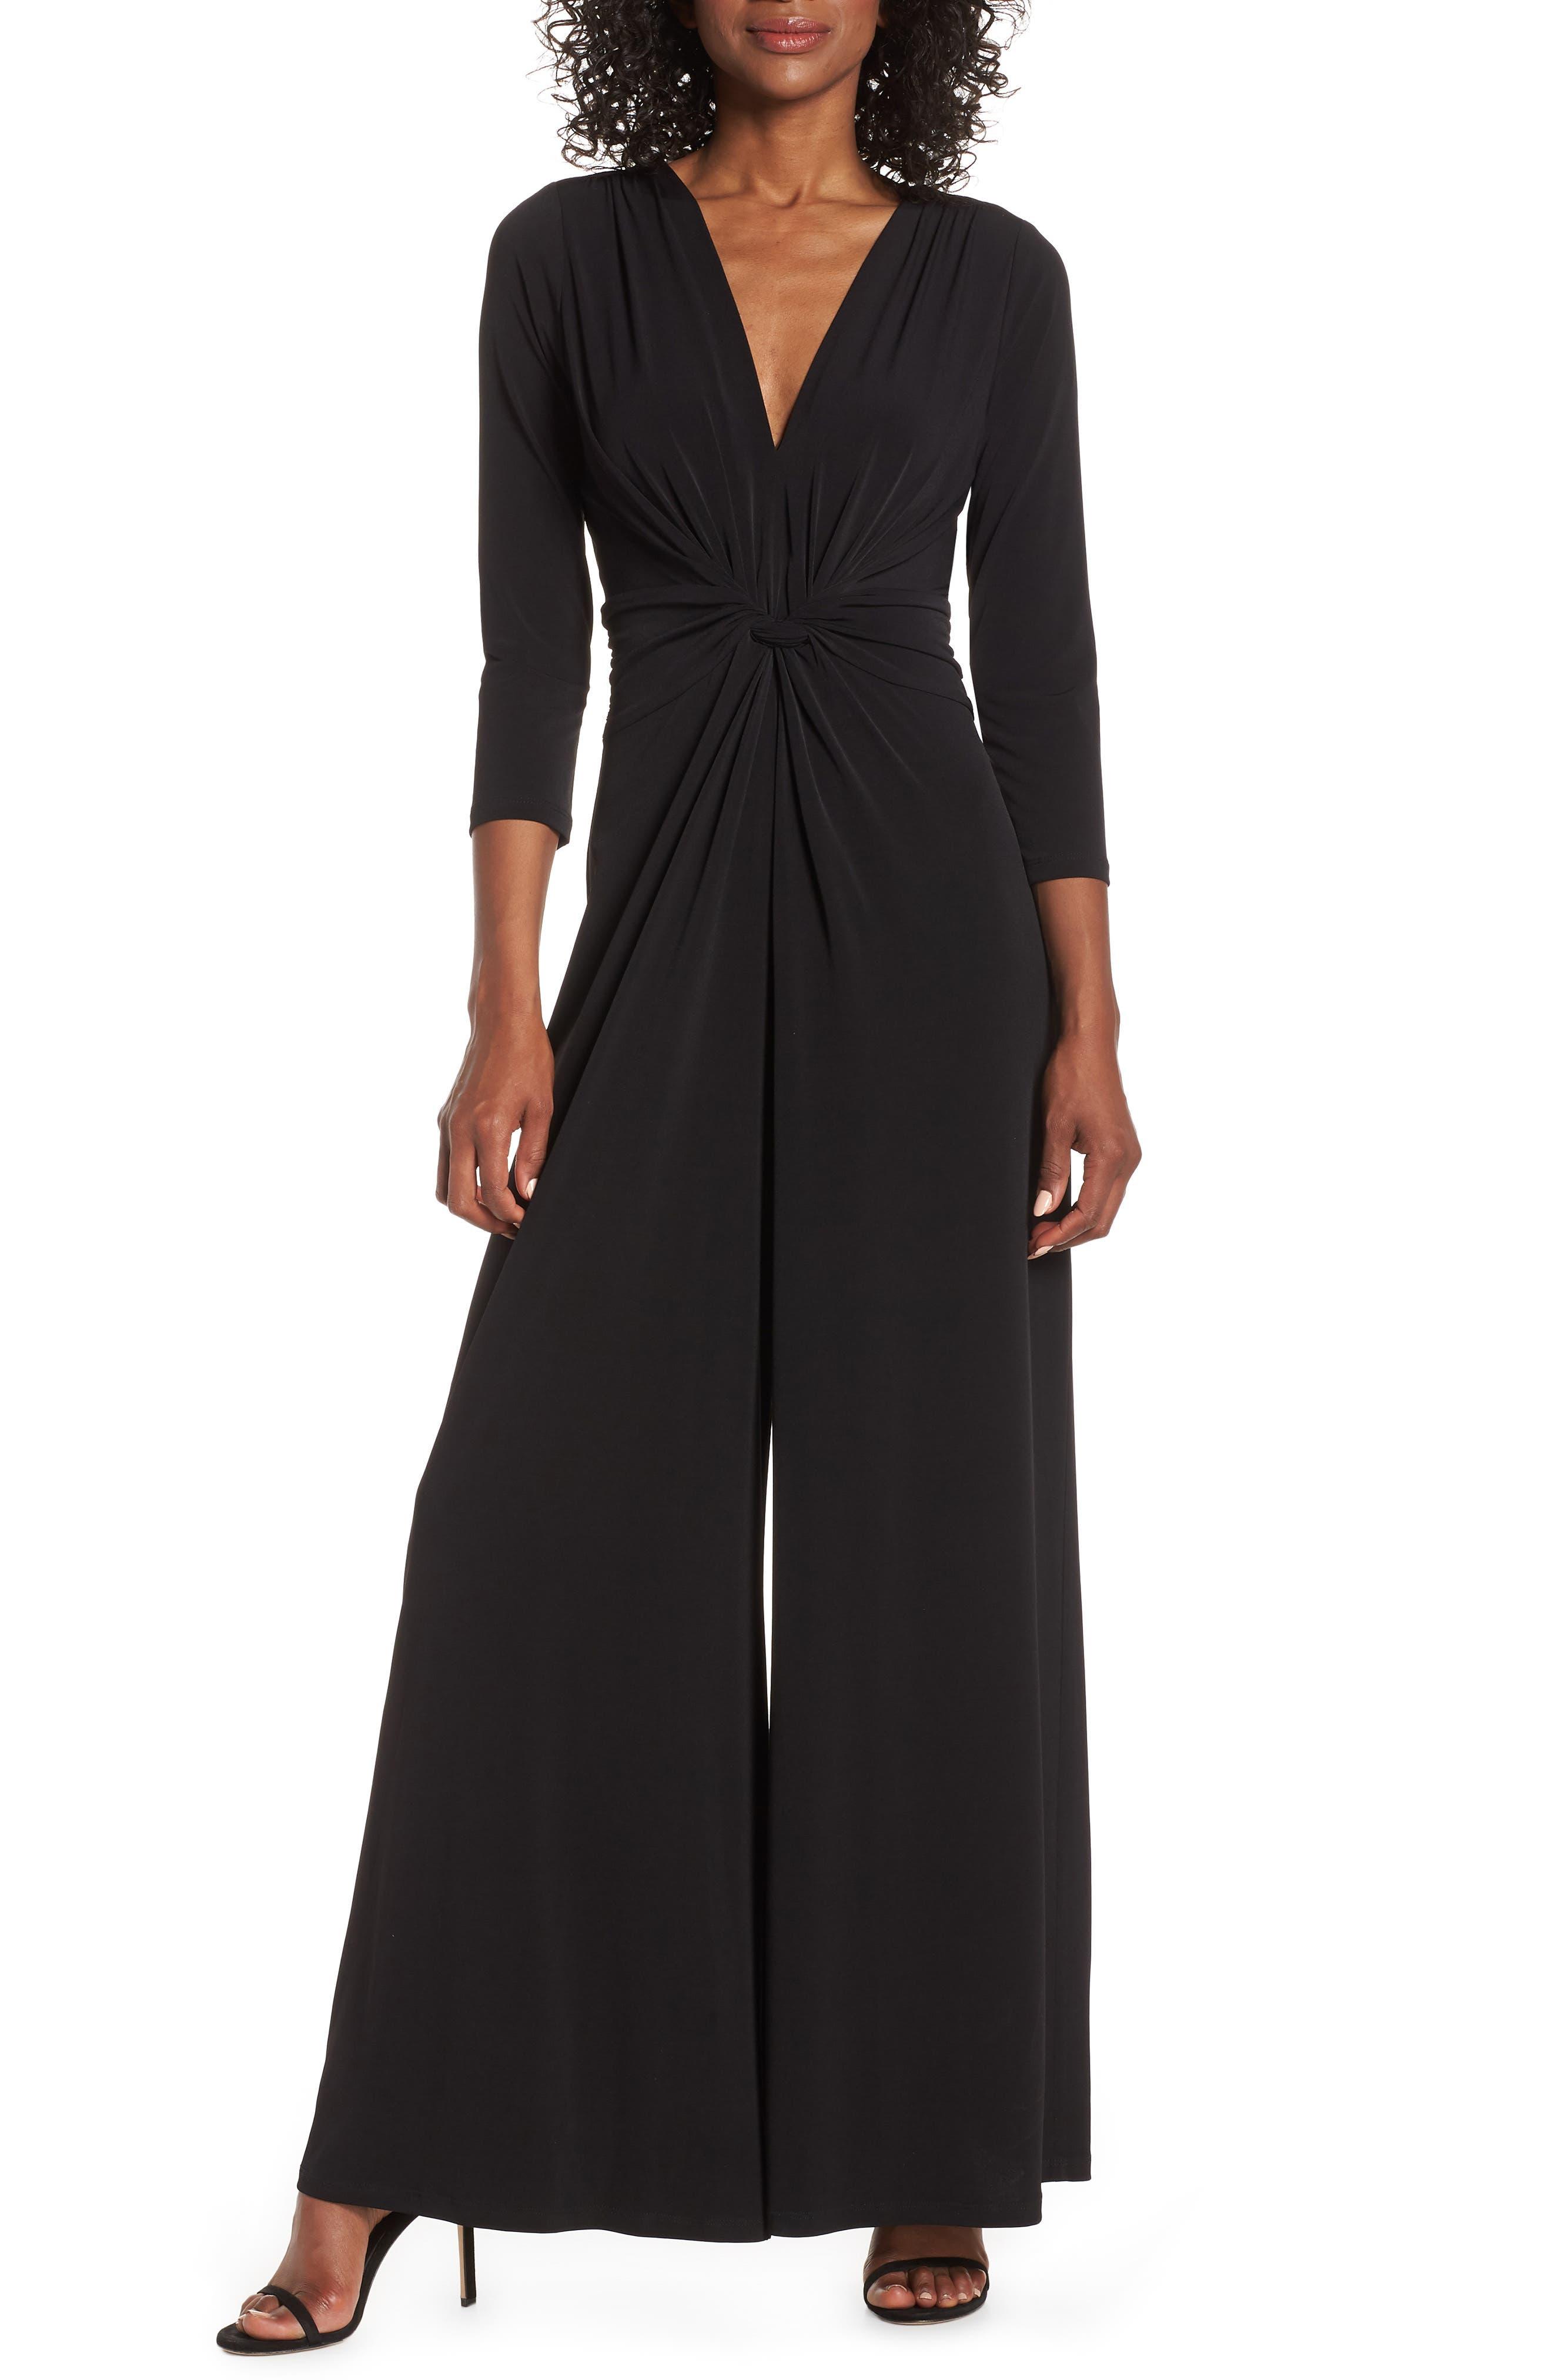 70s Prom, Formal, Evening, Party Dresses Womens Eliza J Twist Wide Leg Jumpsuit Size 18 similar to 14W - Black $108.00 AT vintagedancer.com